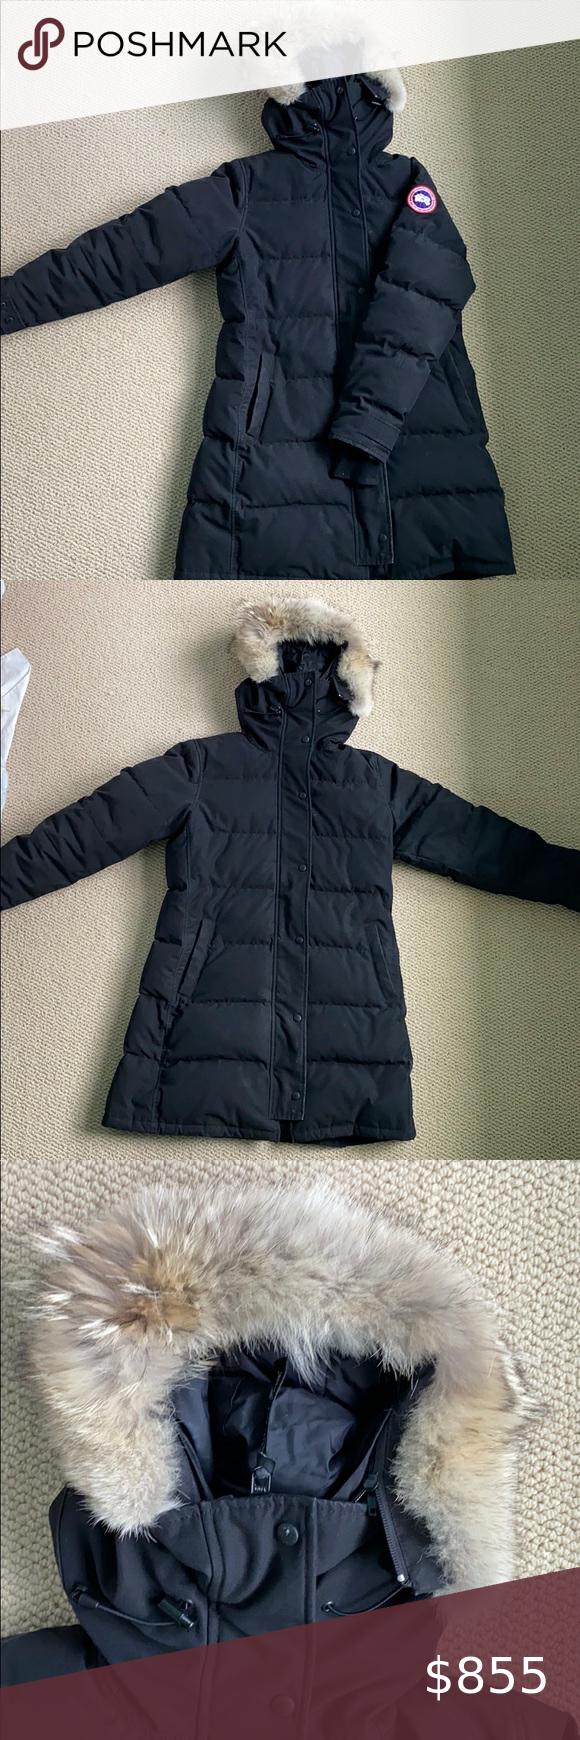 Women S Canada Goose Shelburne Parka Pink North Face Jacket Coats Jackets Women Canada Goose Women [ 1740 x 580 Pixel ]